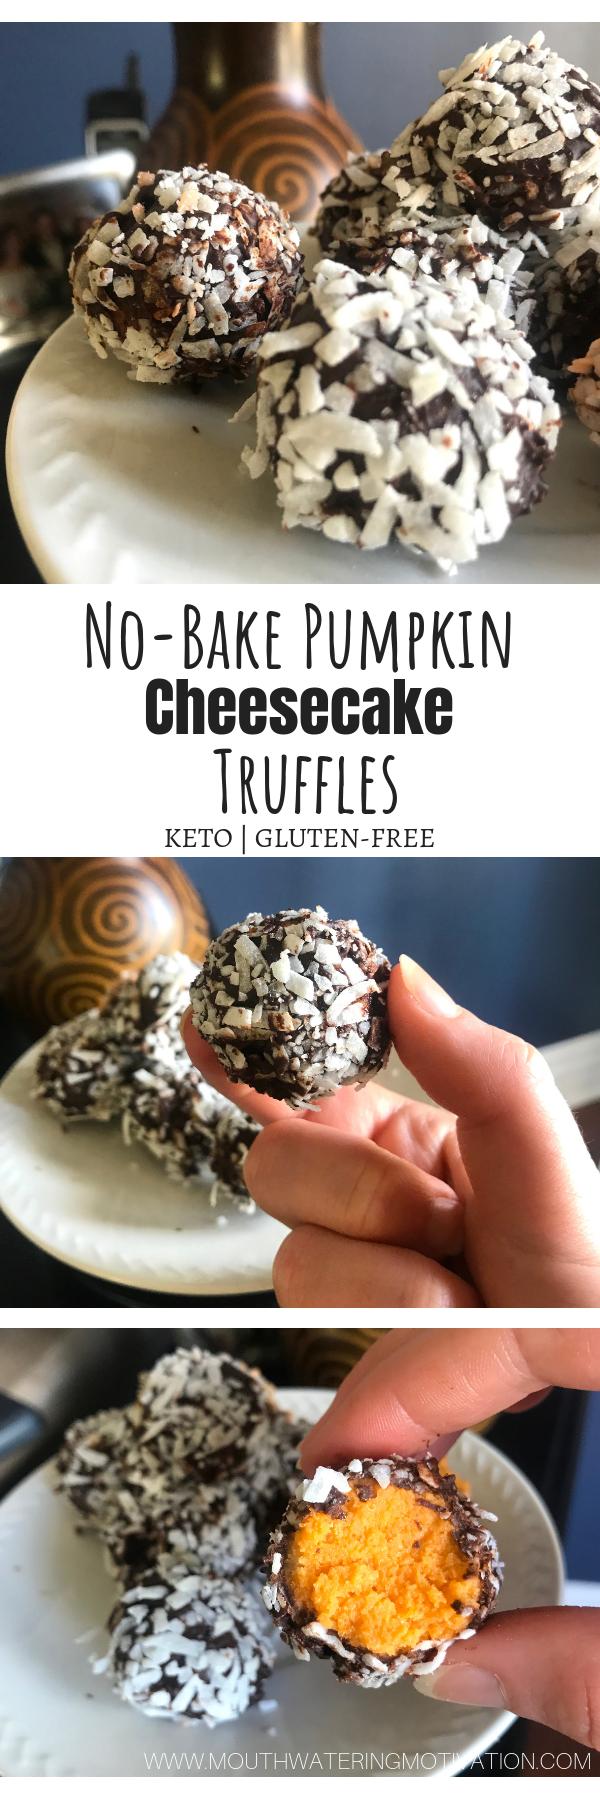 Keto Pumpkin Cheesecake Truffles.png